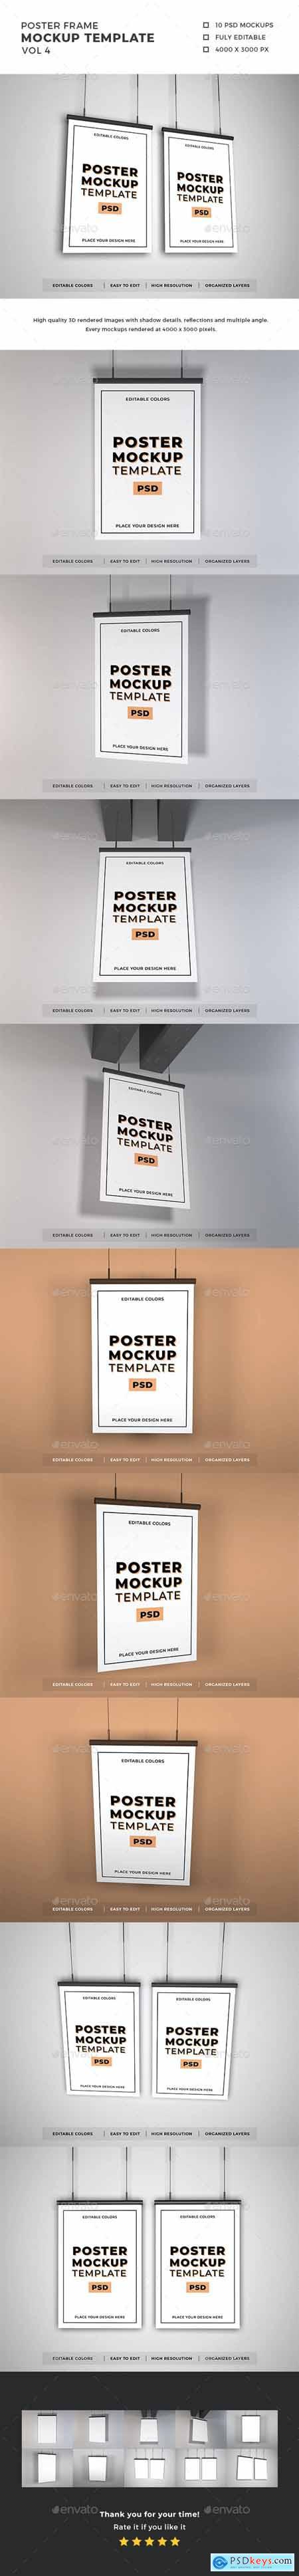 Poster Frame Mockup Template Vol 4 29354920